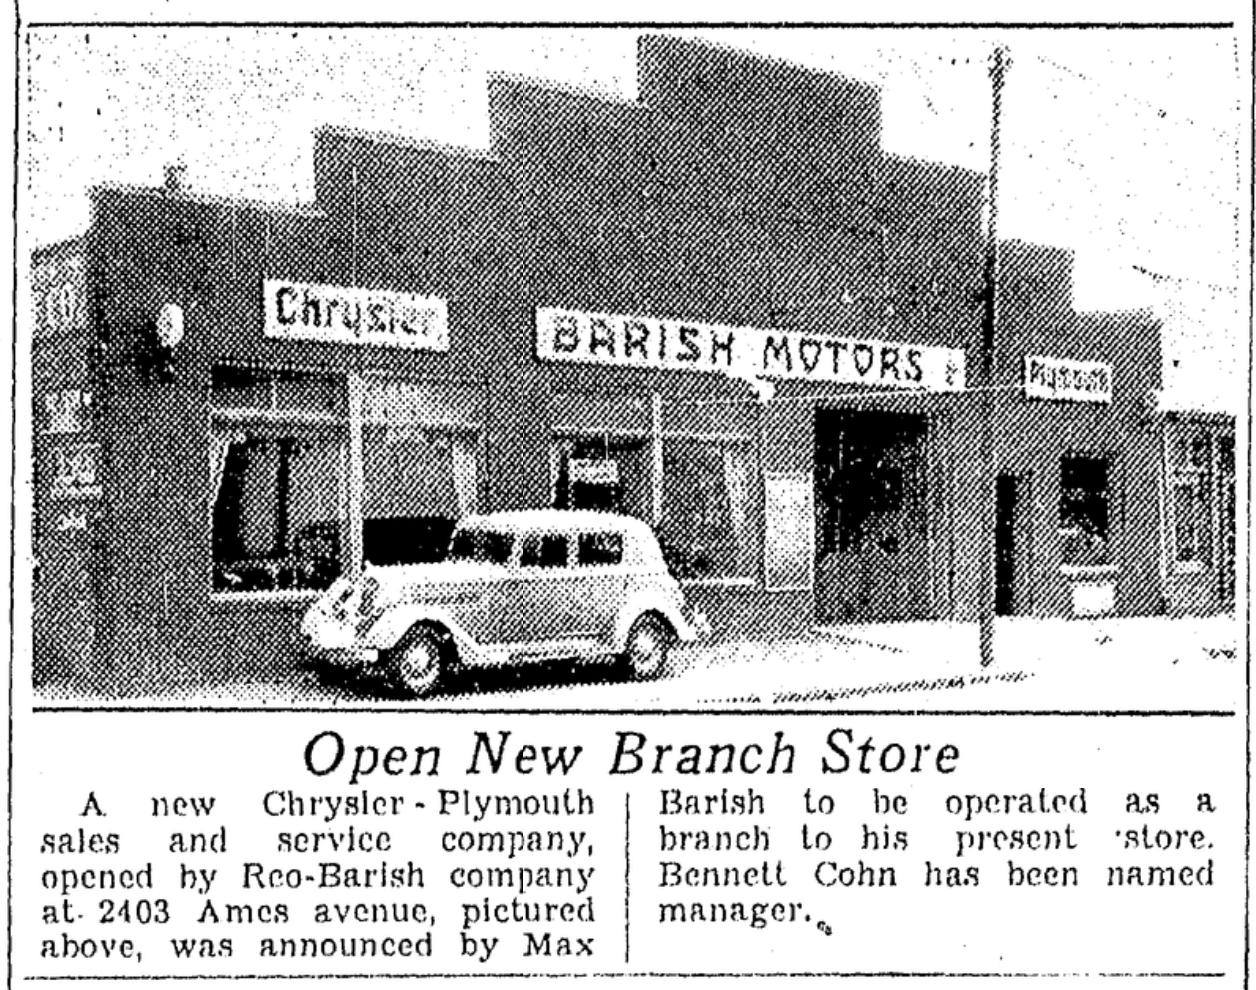 Barish Motors Chrysler-Plymouth, 2403 Ames Avenue, North Omaha, Nebraska